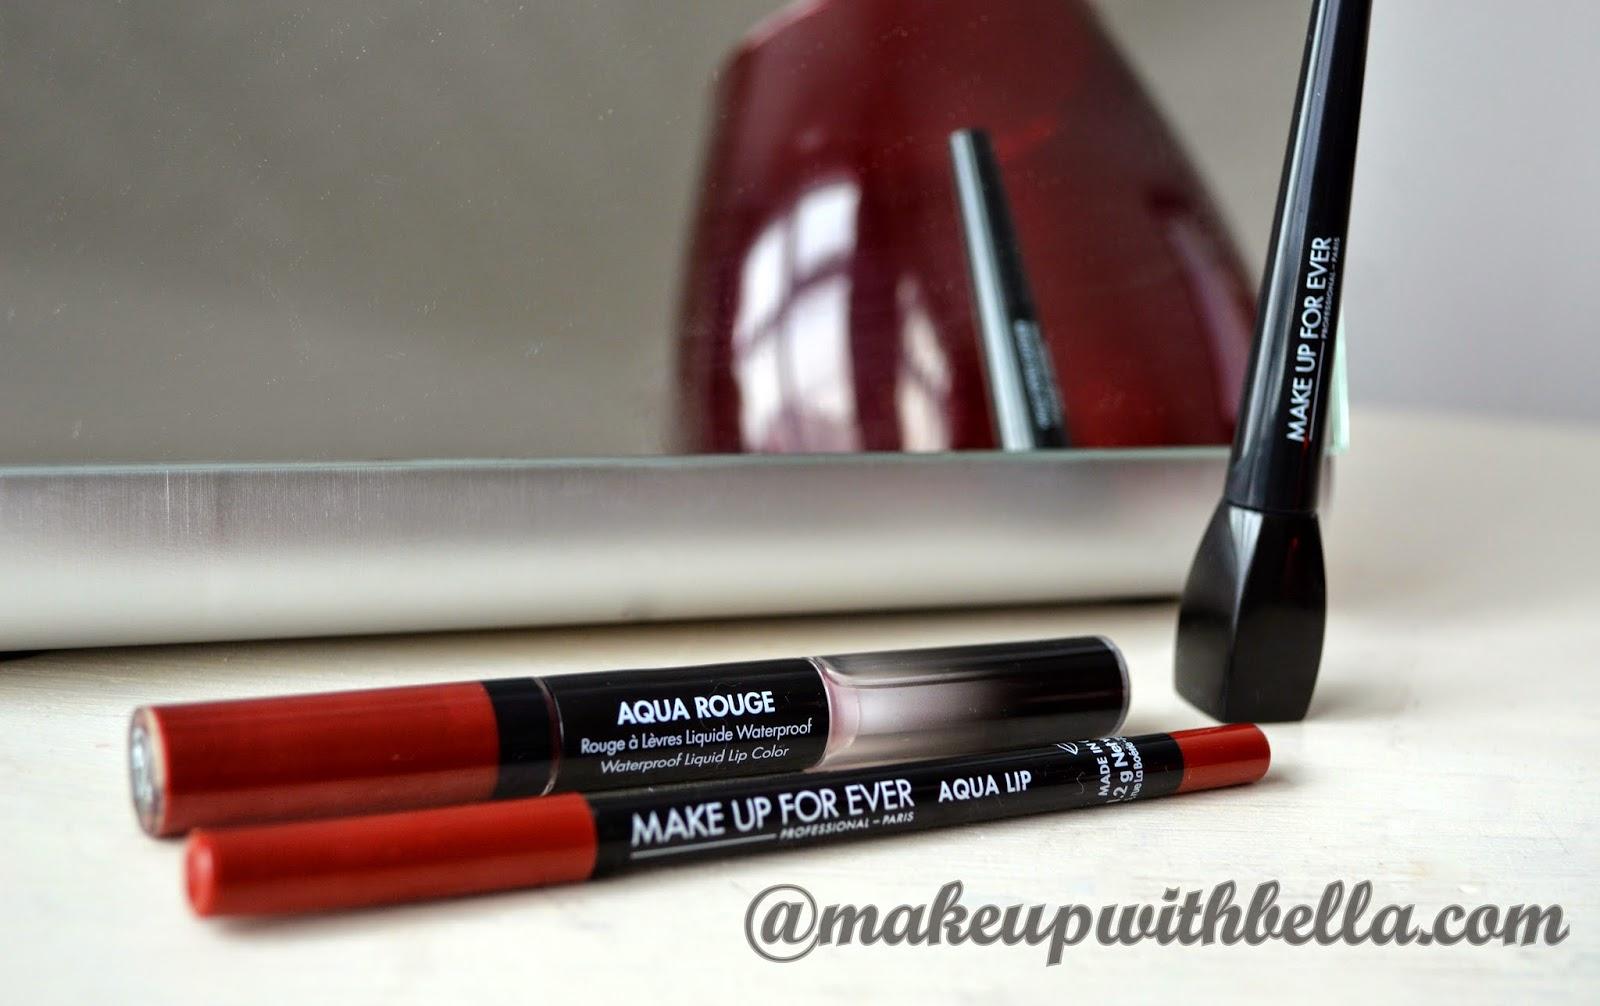 makeup with bella make up for ever aqua lipstick pencil and ink liner review. Black Bedroom Furniture Sets. Home Design Ideas